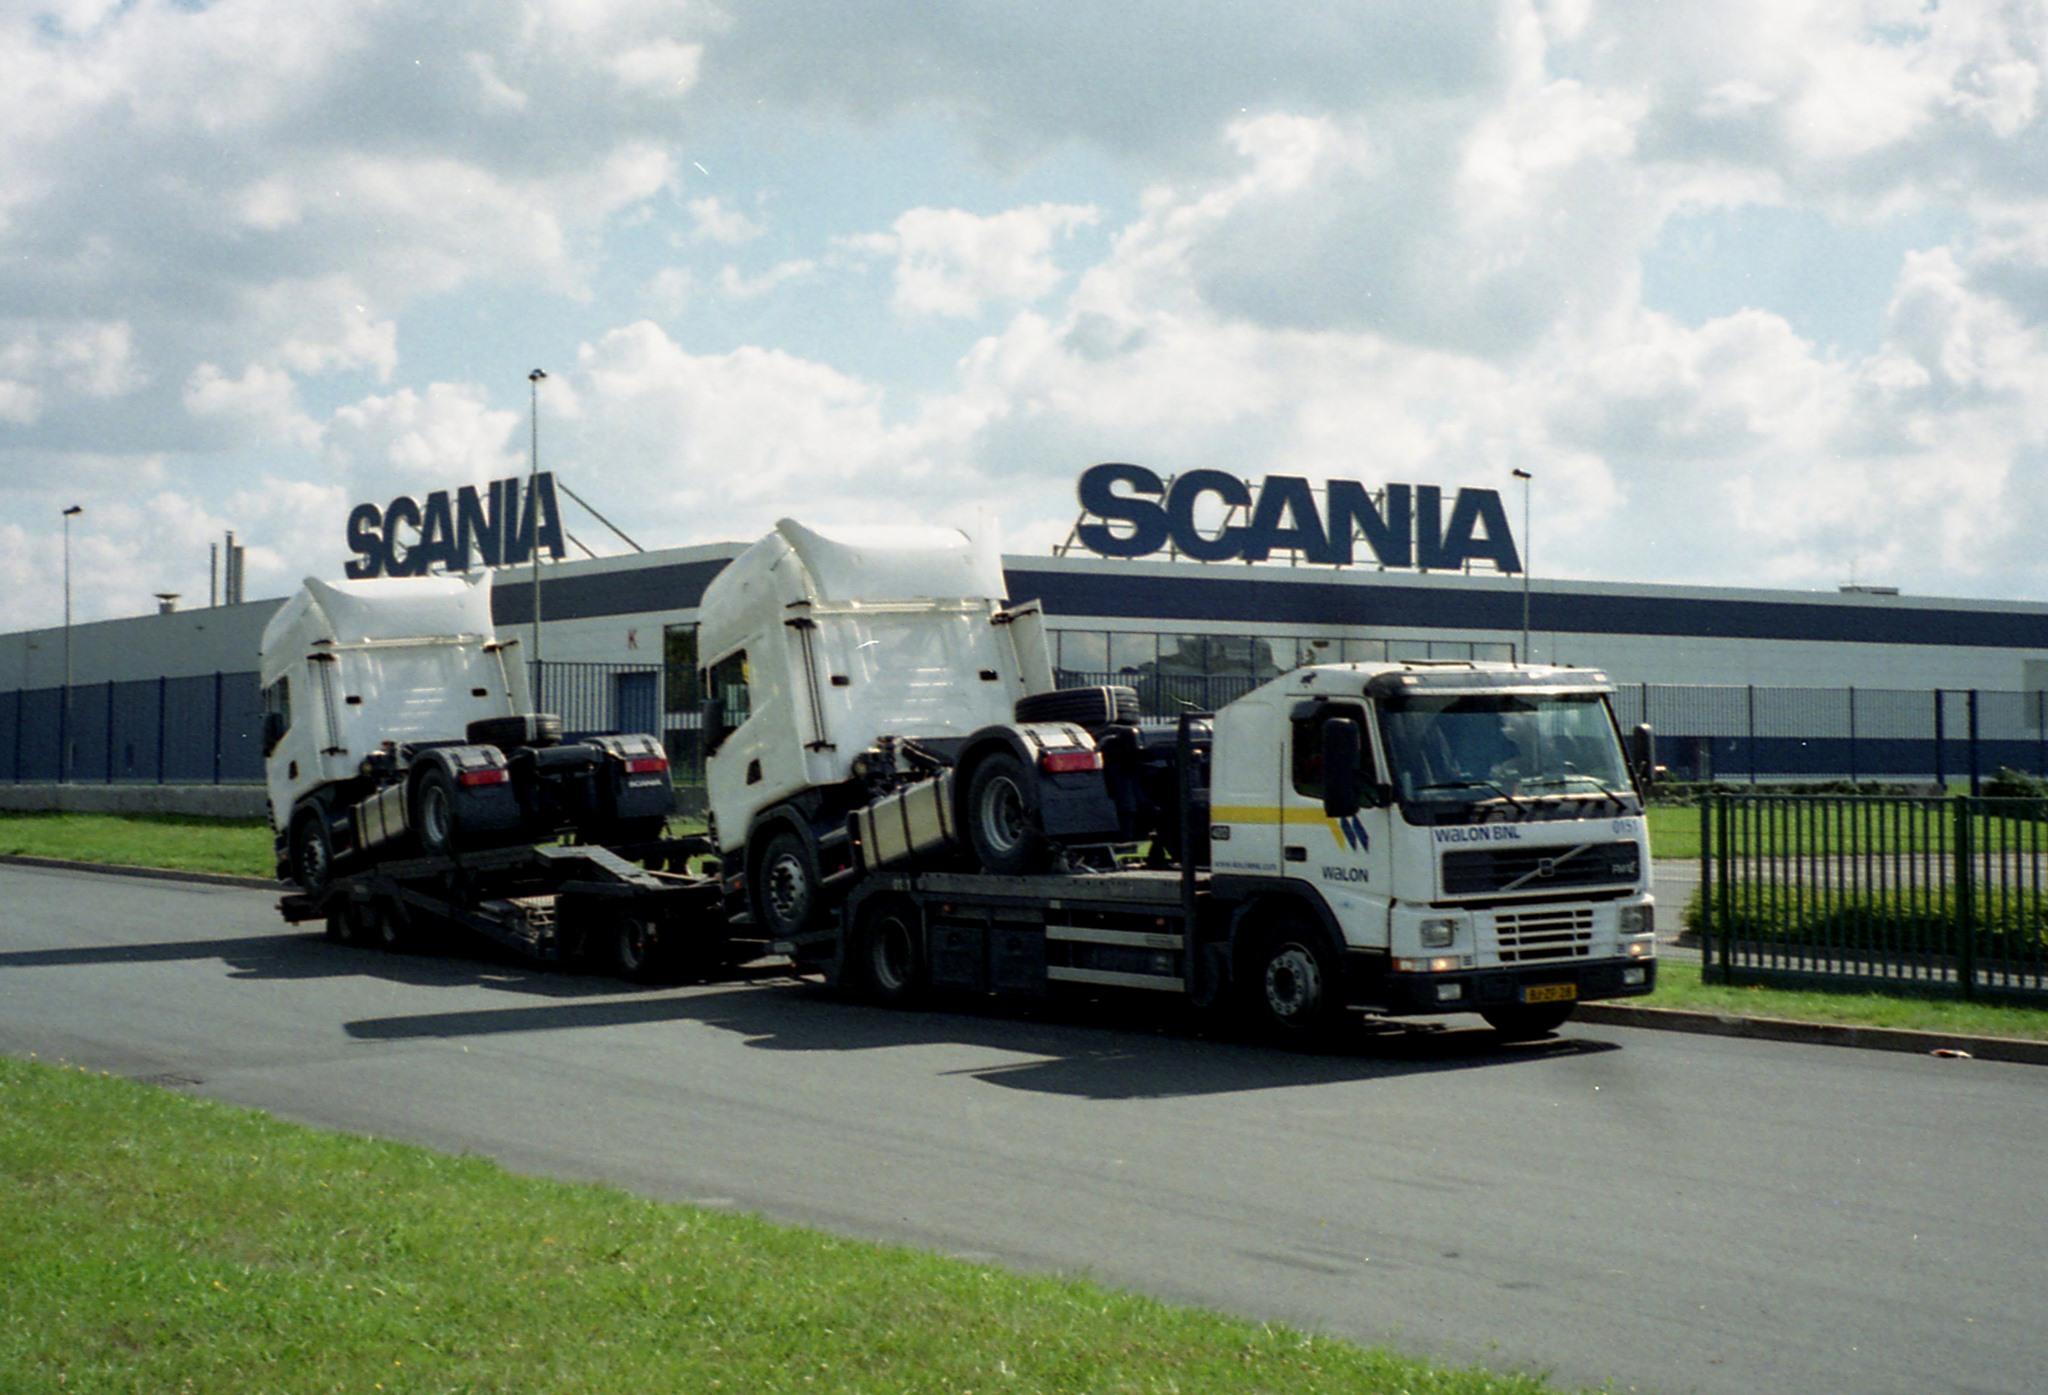 Walon--Scania-Angers-France